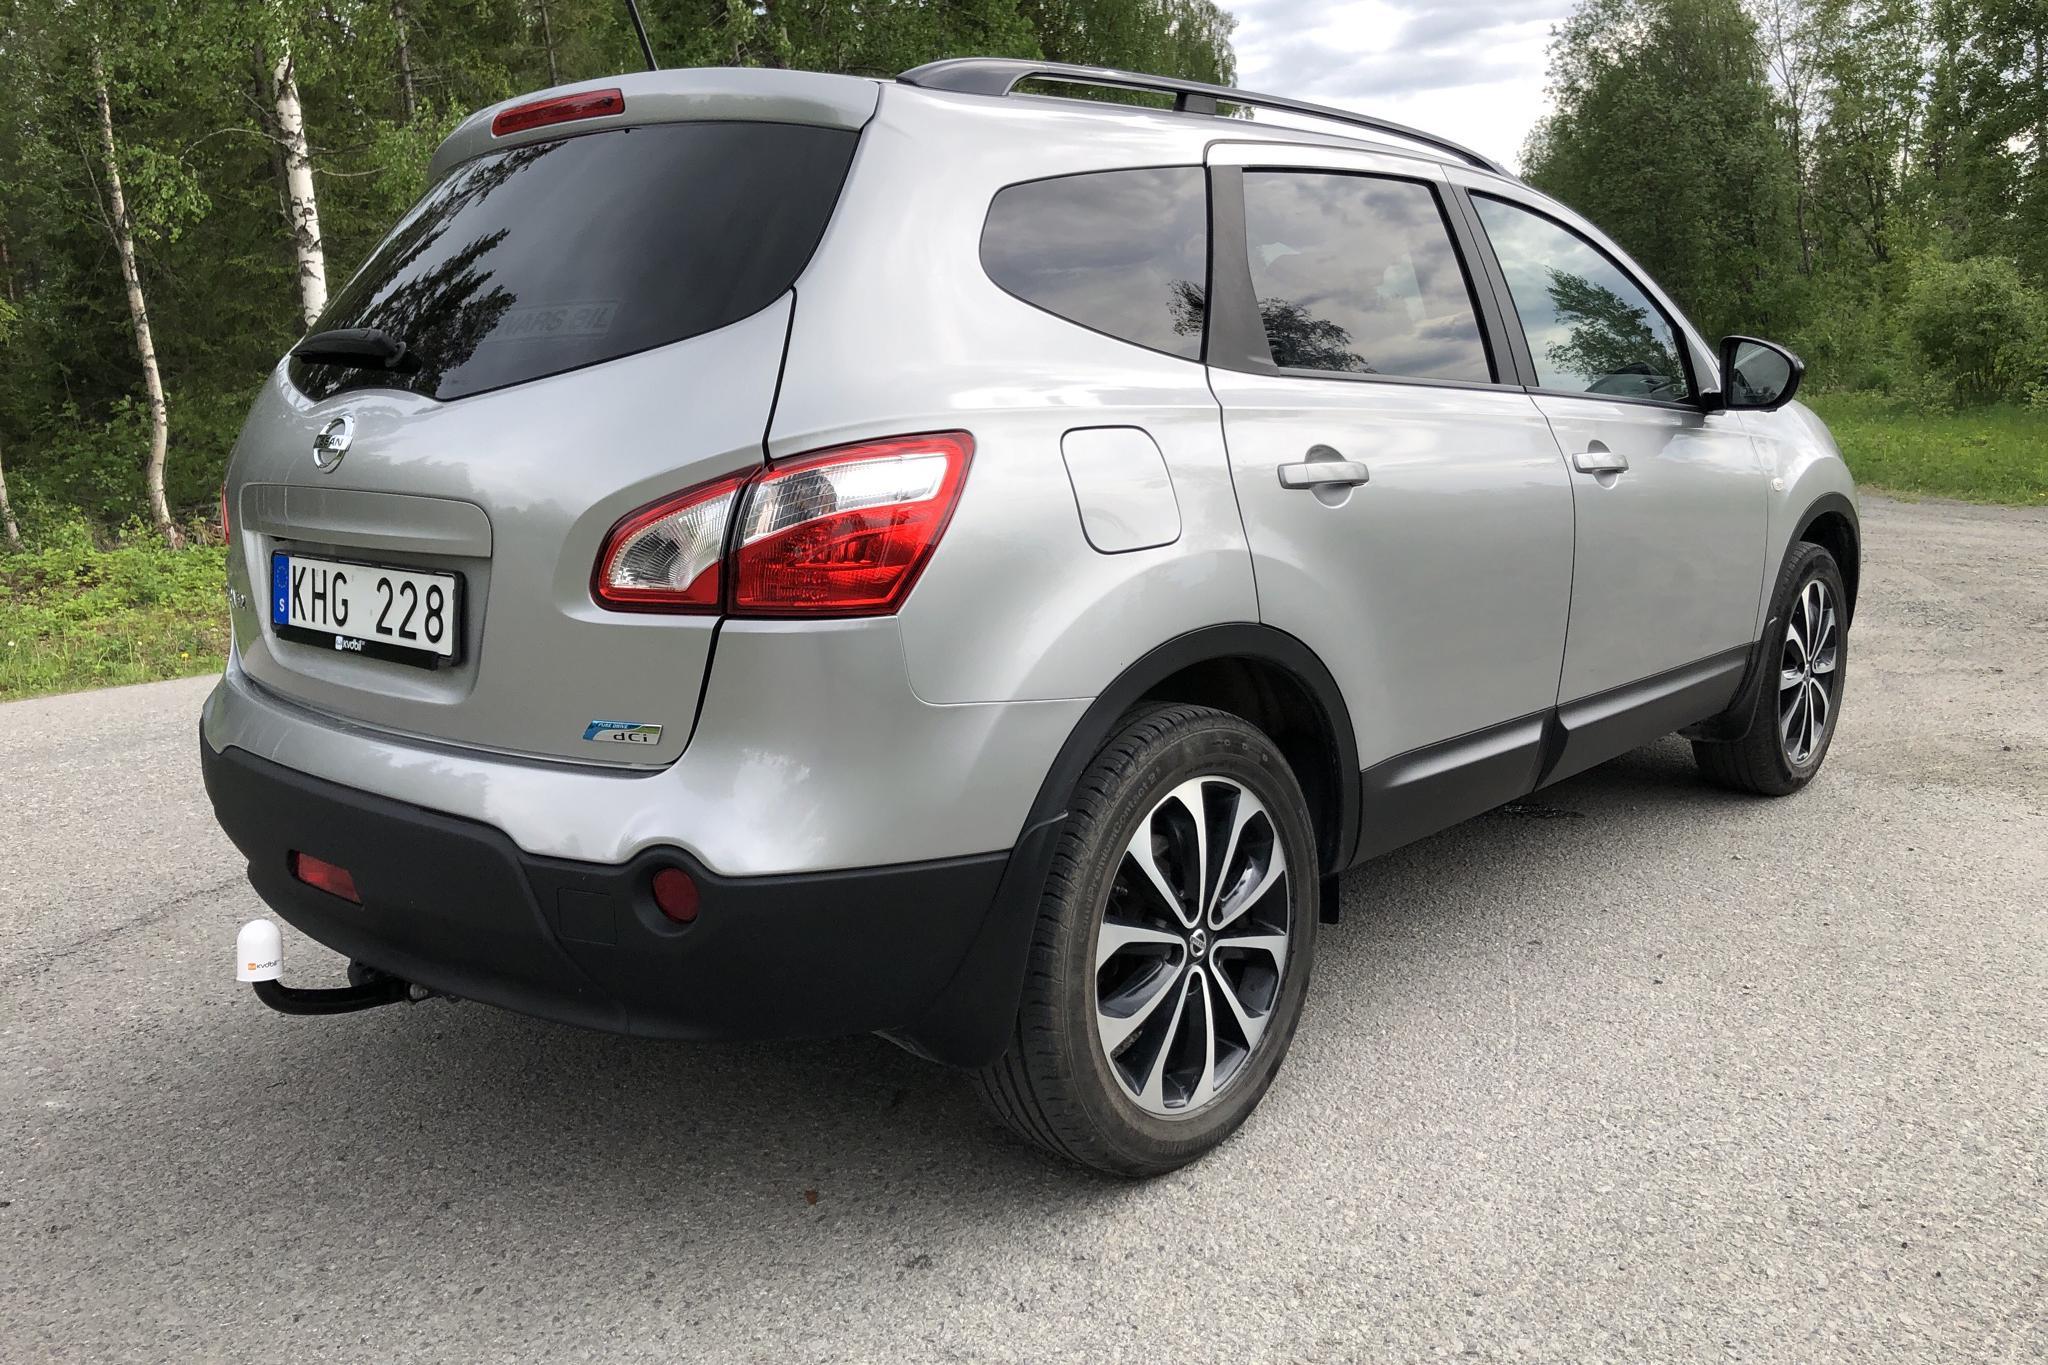 Nissan Qashqai+2 1.6 dCi (130hk) - 7 938 mil - Manuell - silver - 2013